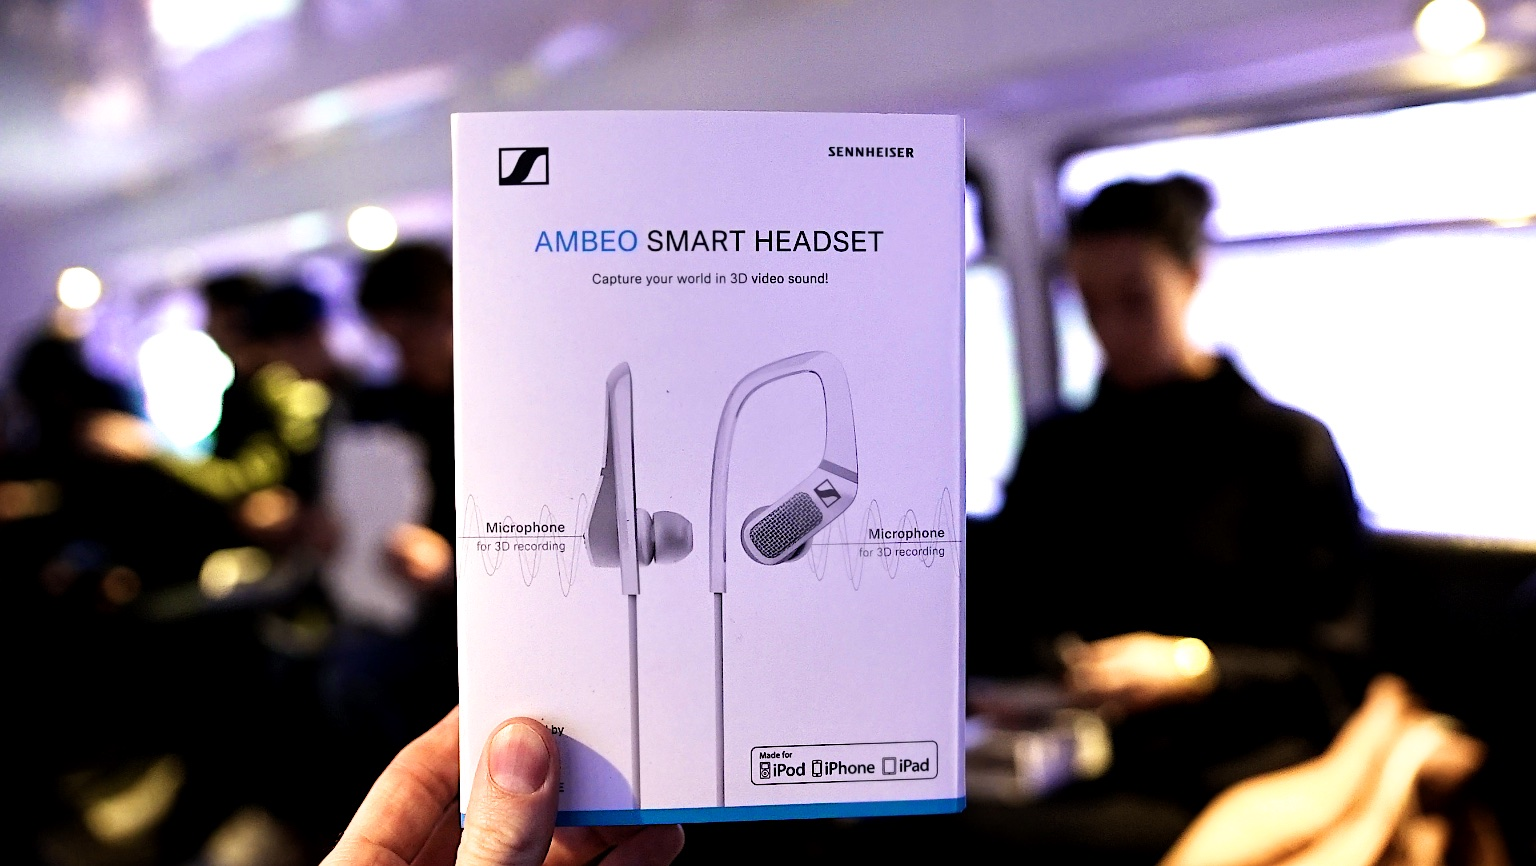 Sennheiser AMBEO Smart headset Influencer